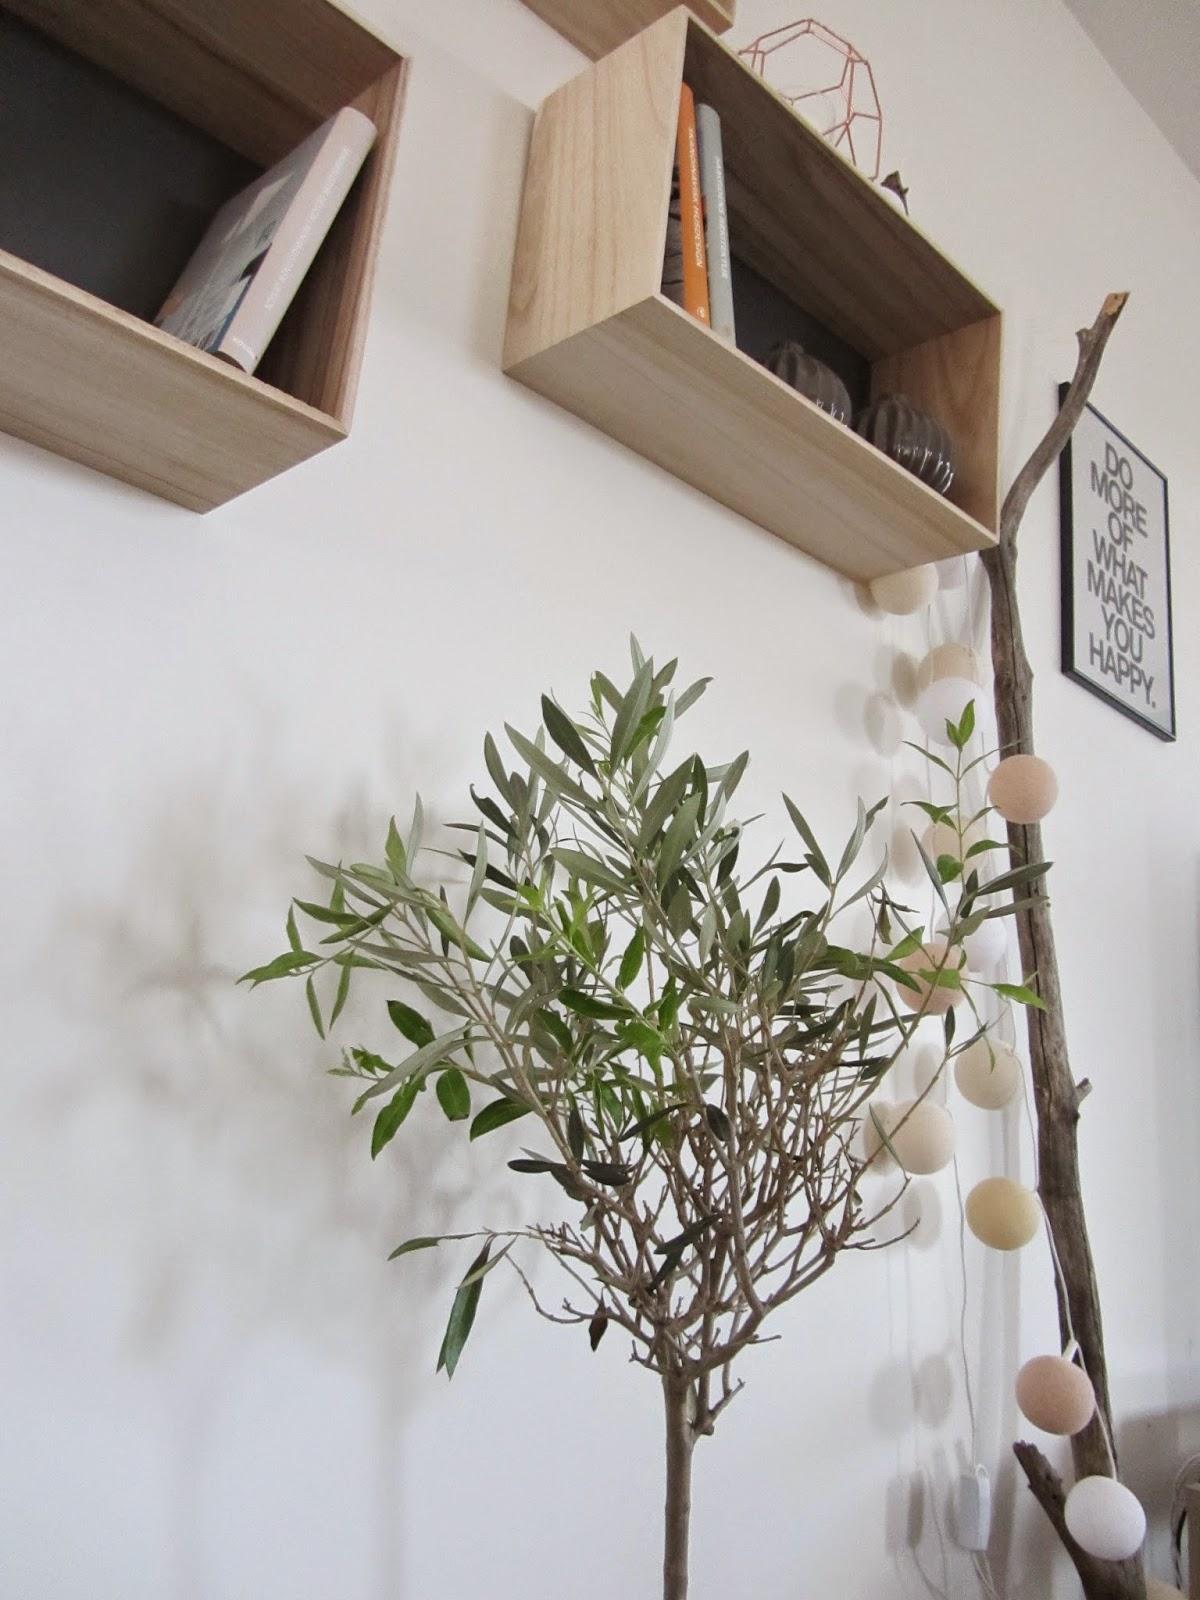 Villa Hov: Lesekrok i stuen som tar minimal plass